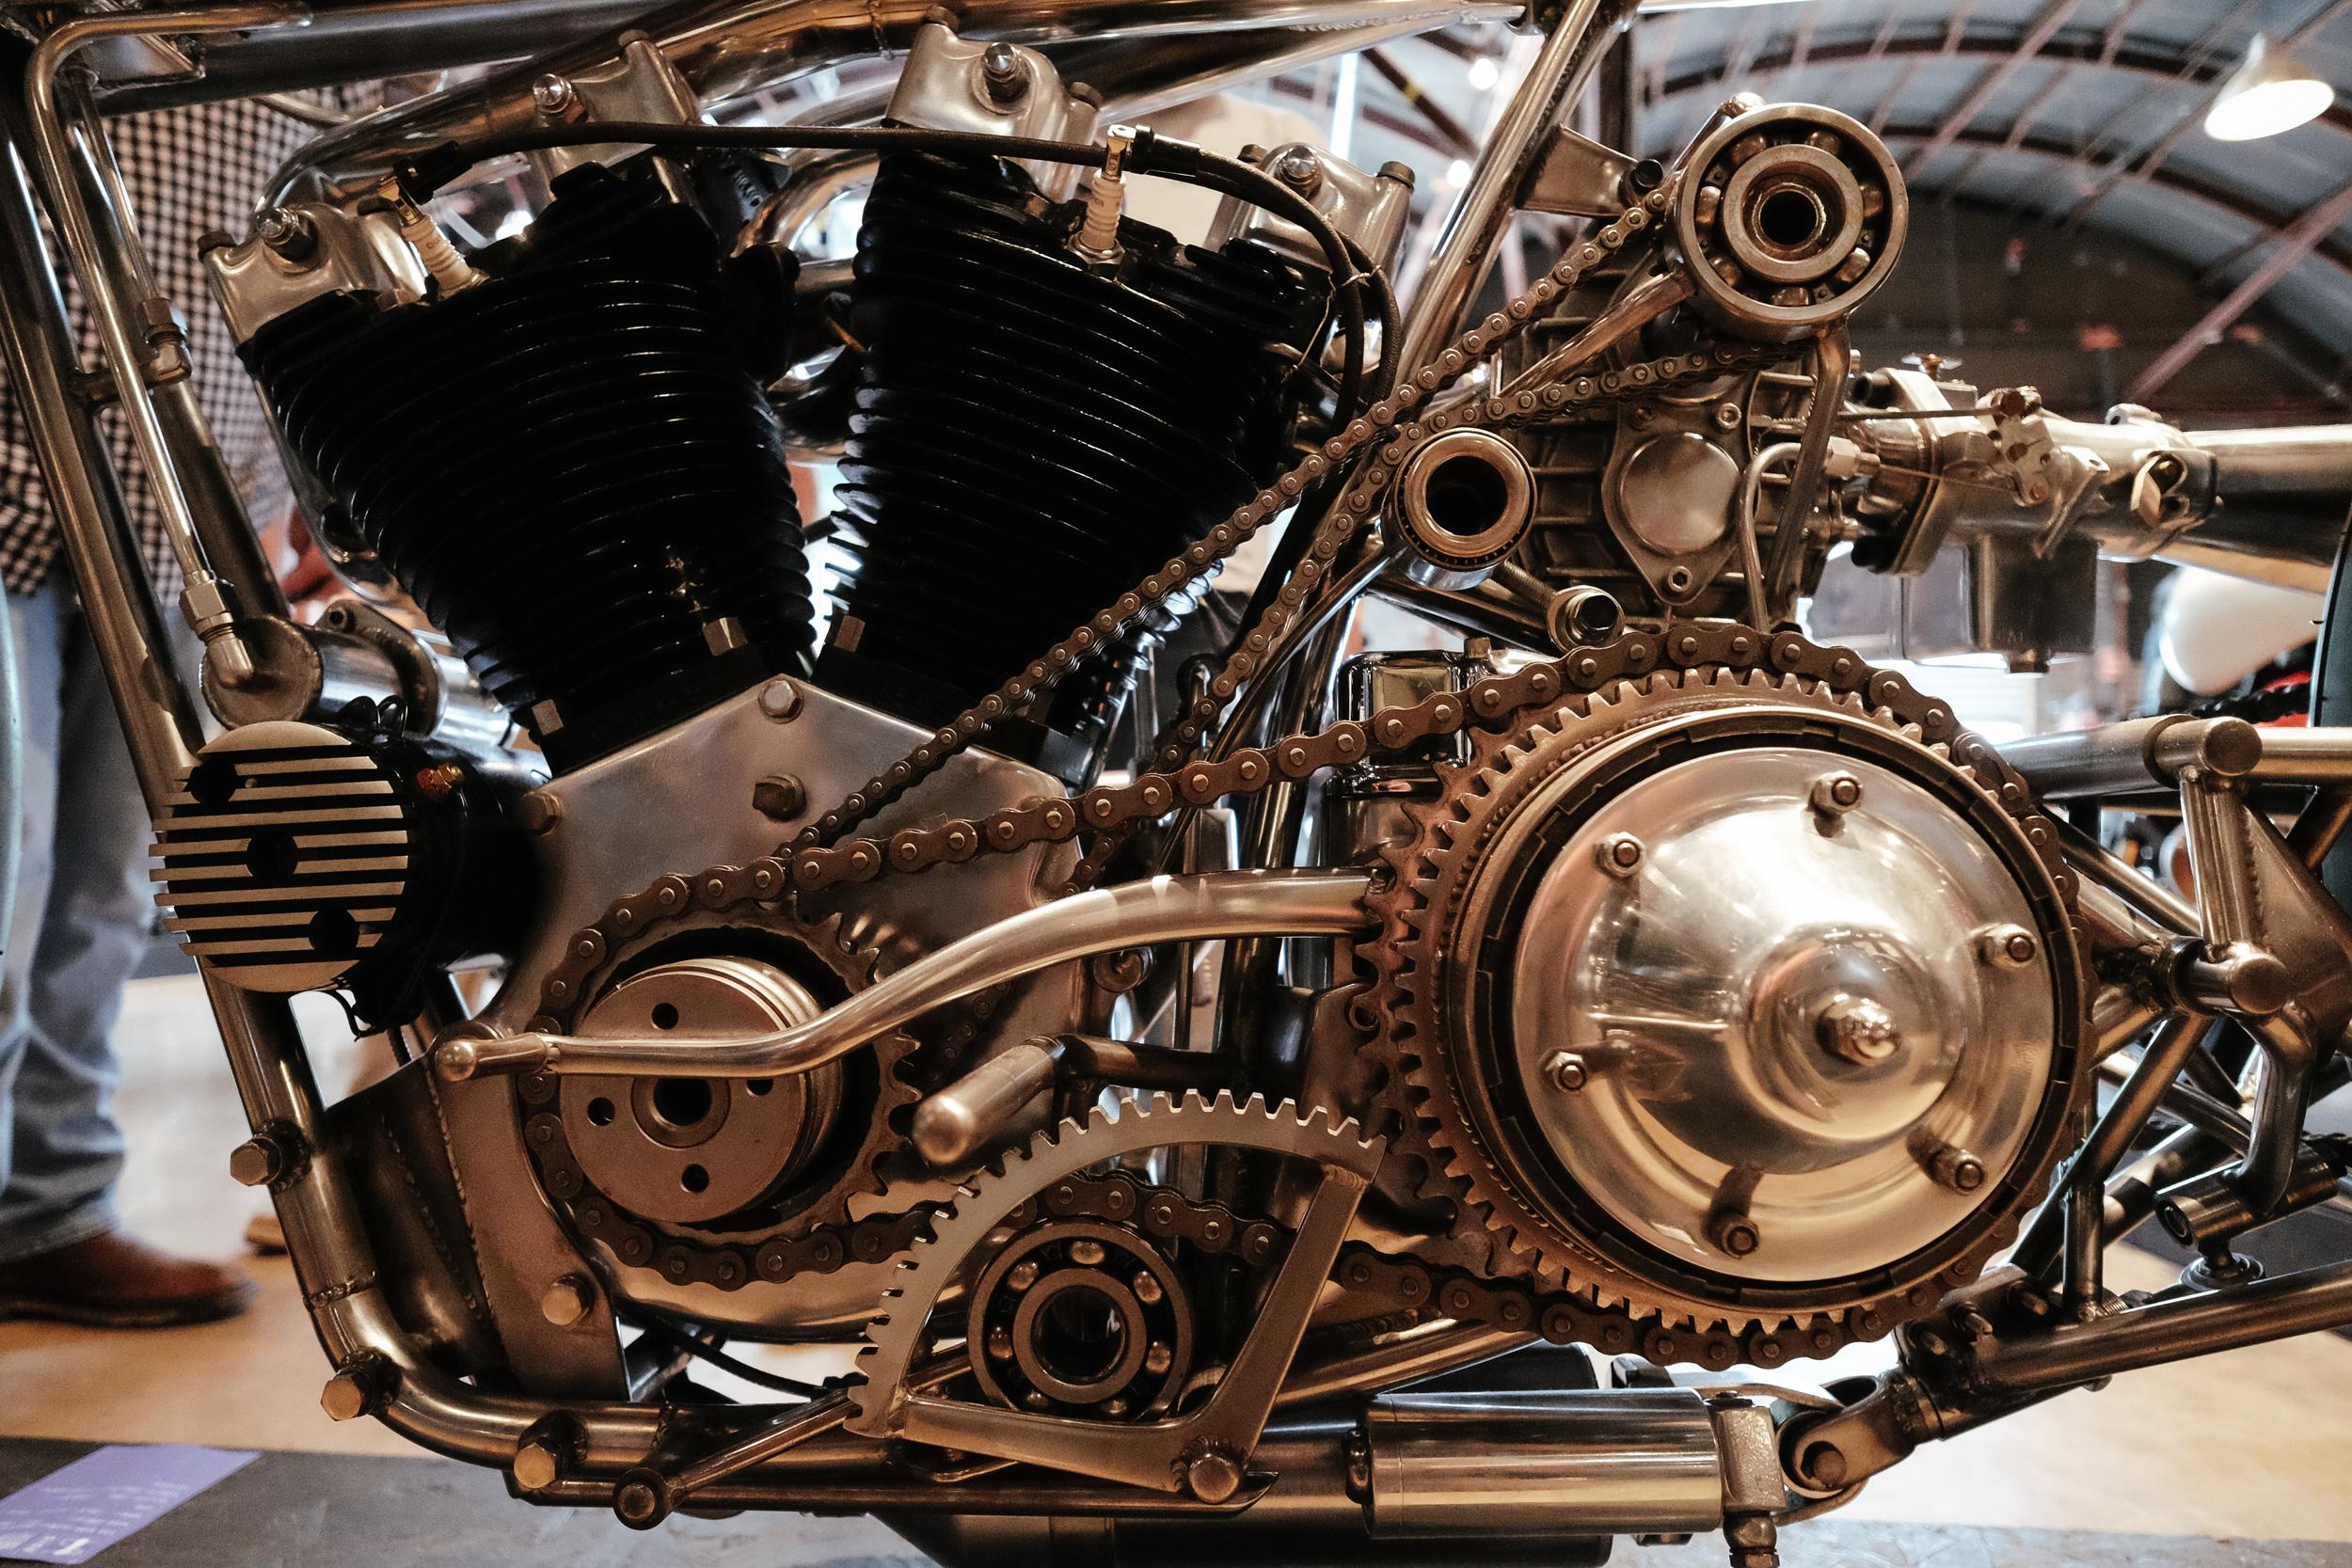 Handbuilt-Motorcycle-Show-2015-8145.jpg